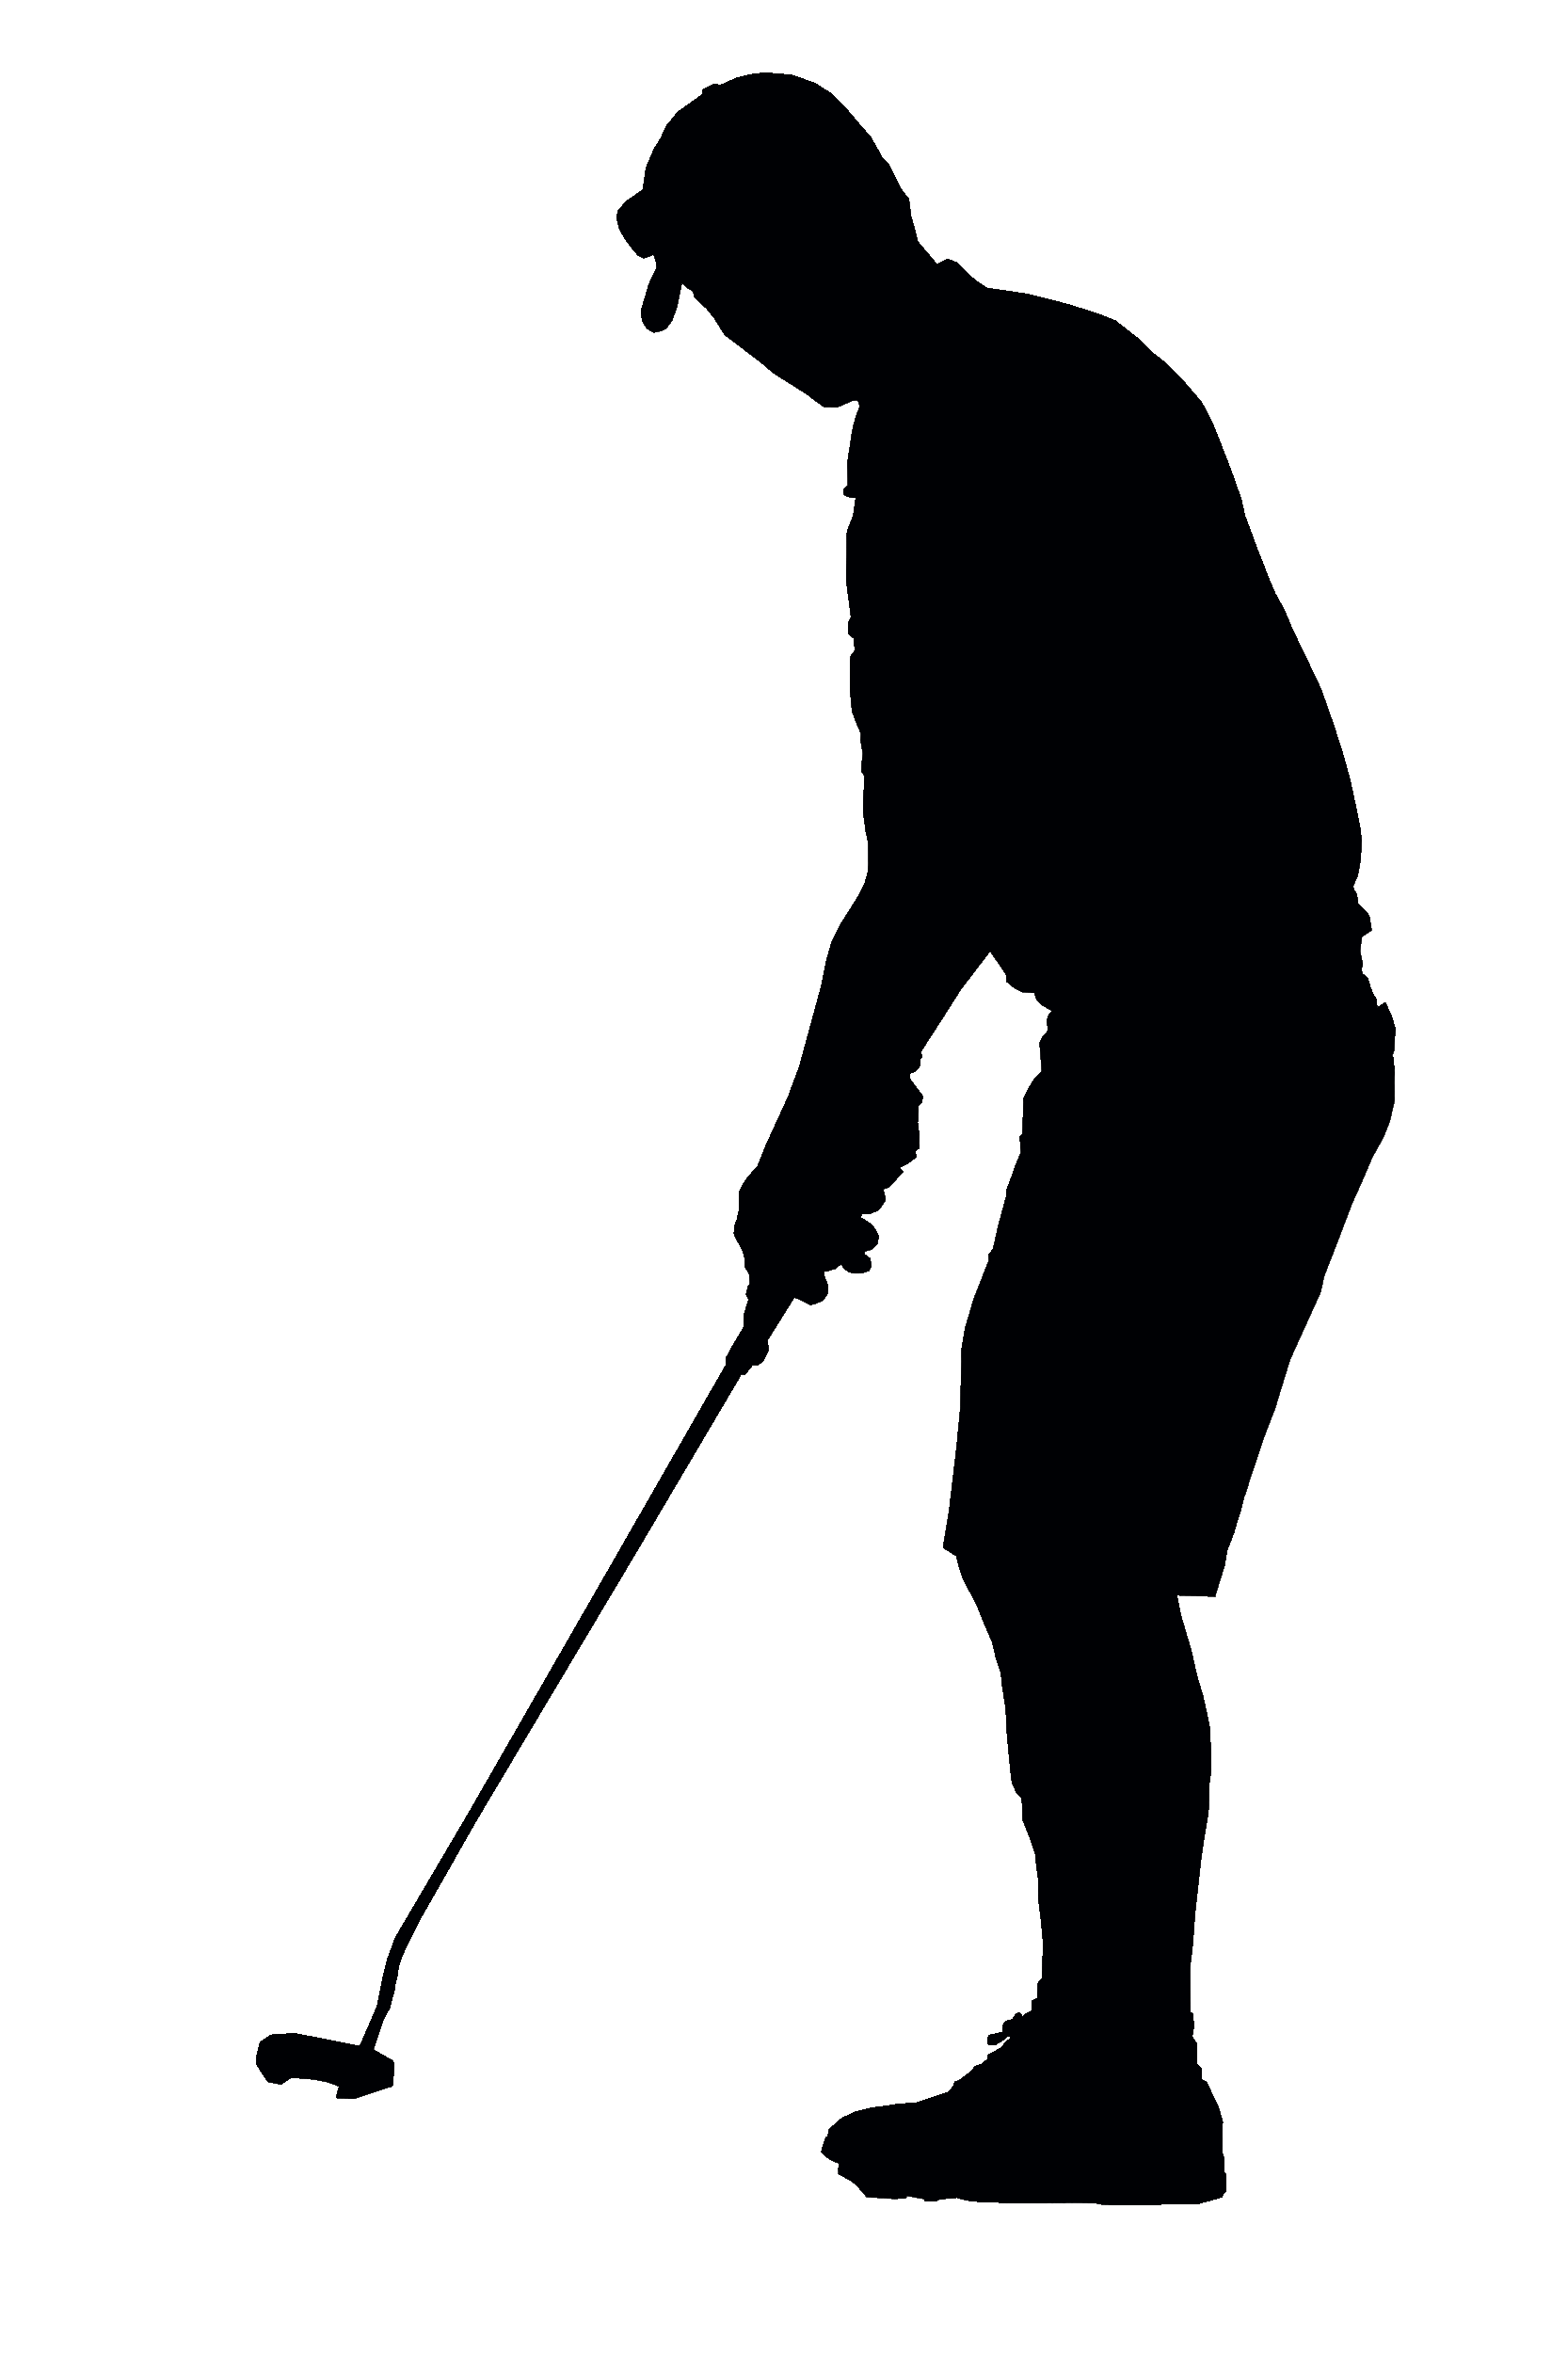 Swing silhouette at getdrawings. Golfer clipart men's